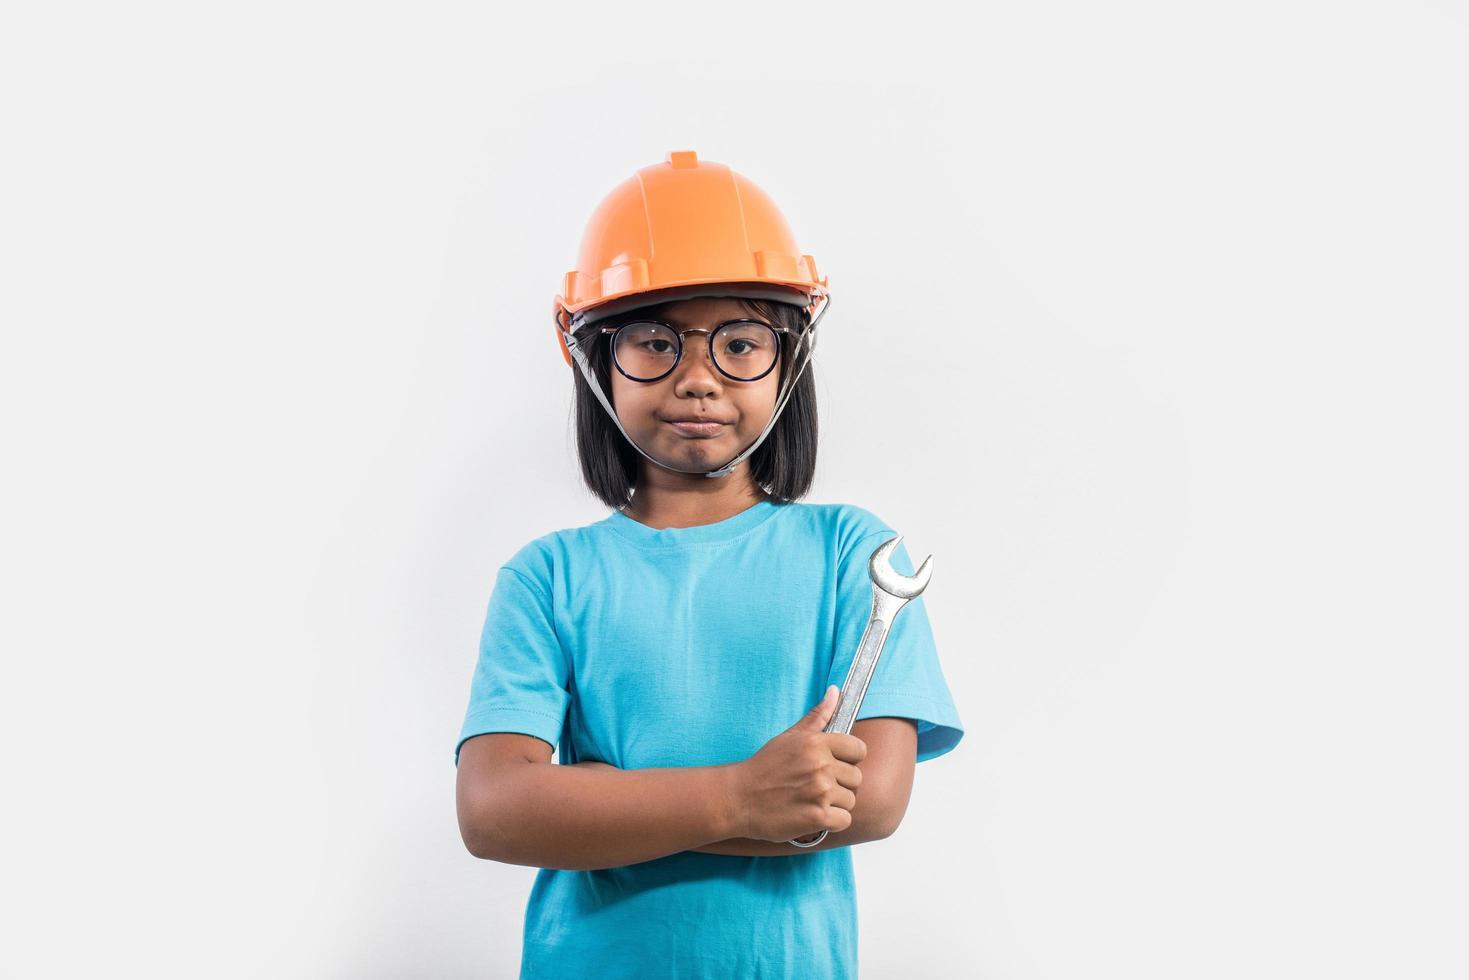 niña con casco naranja en tiro de estudio. foto